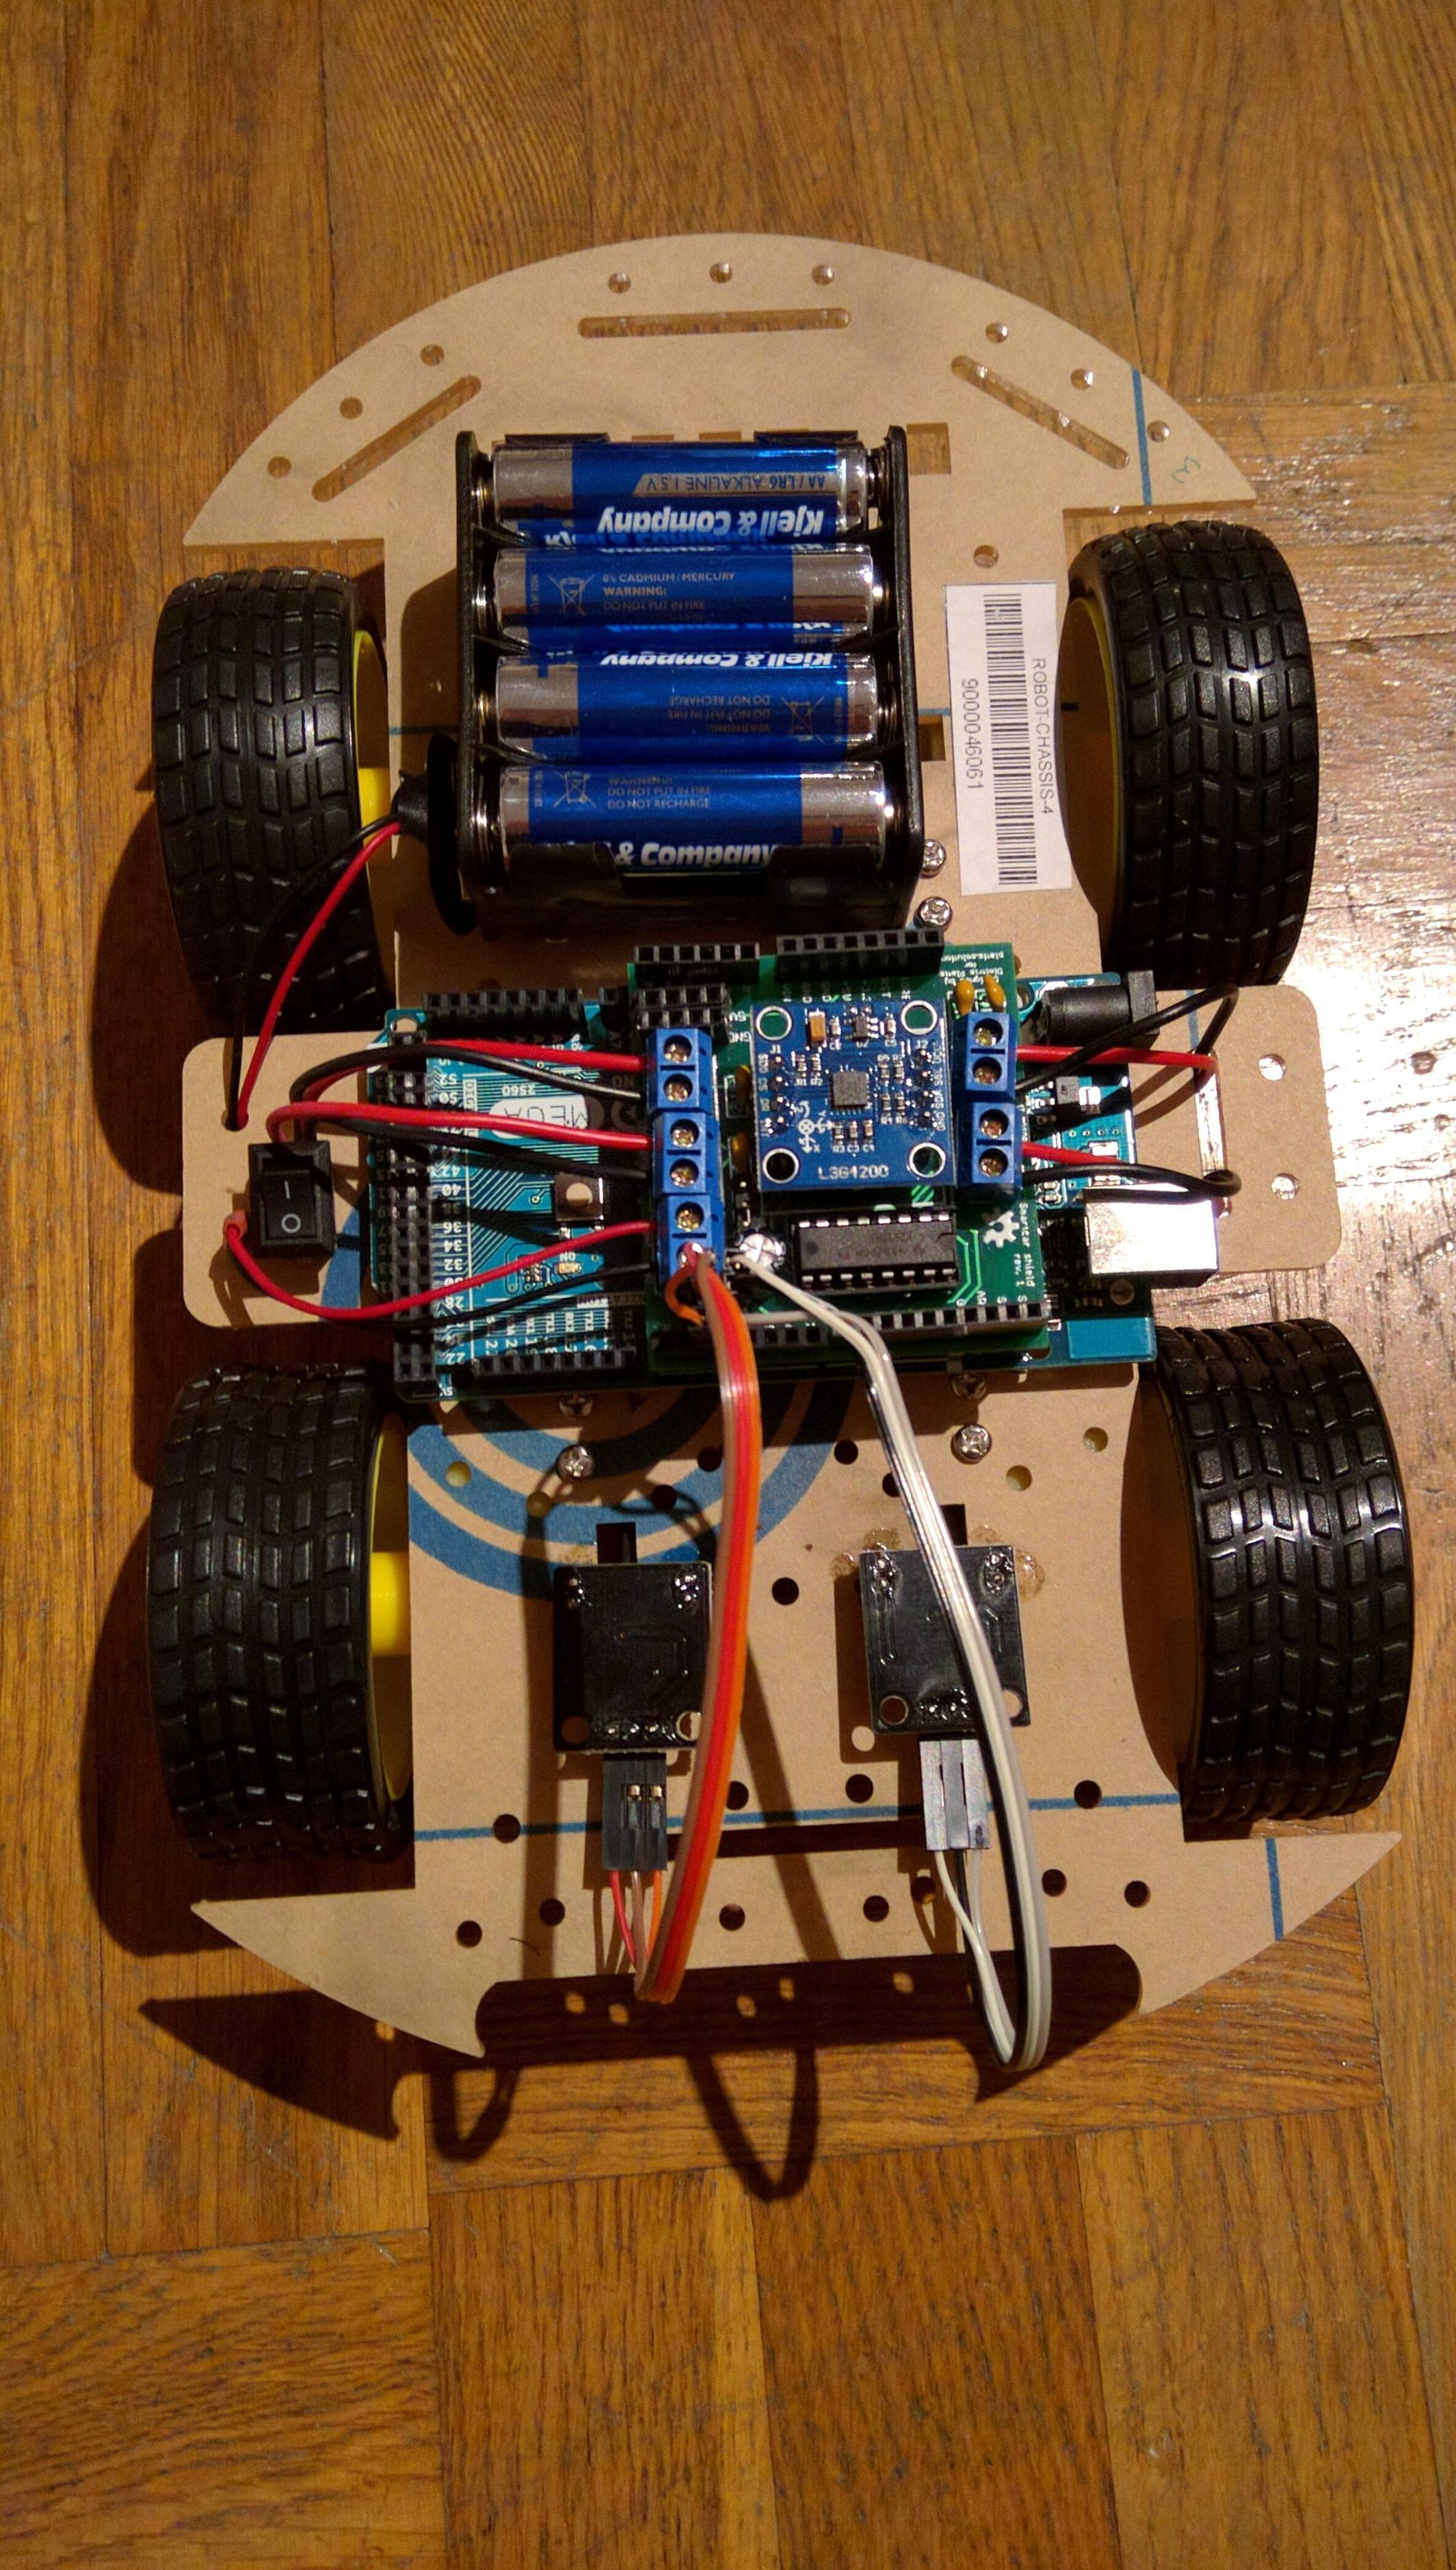 Smartcar overview